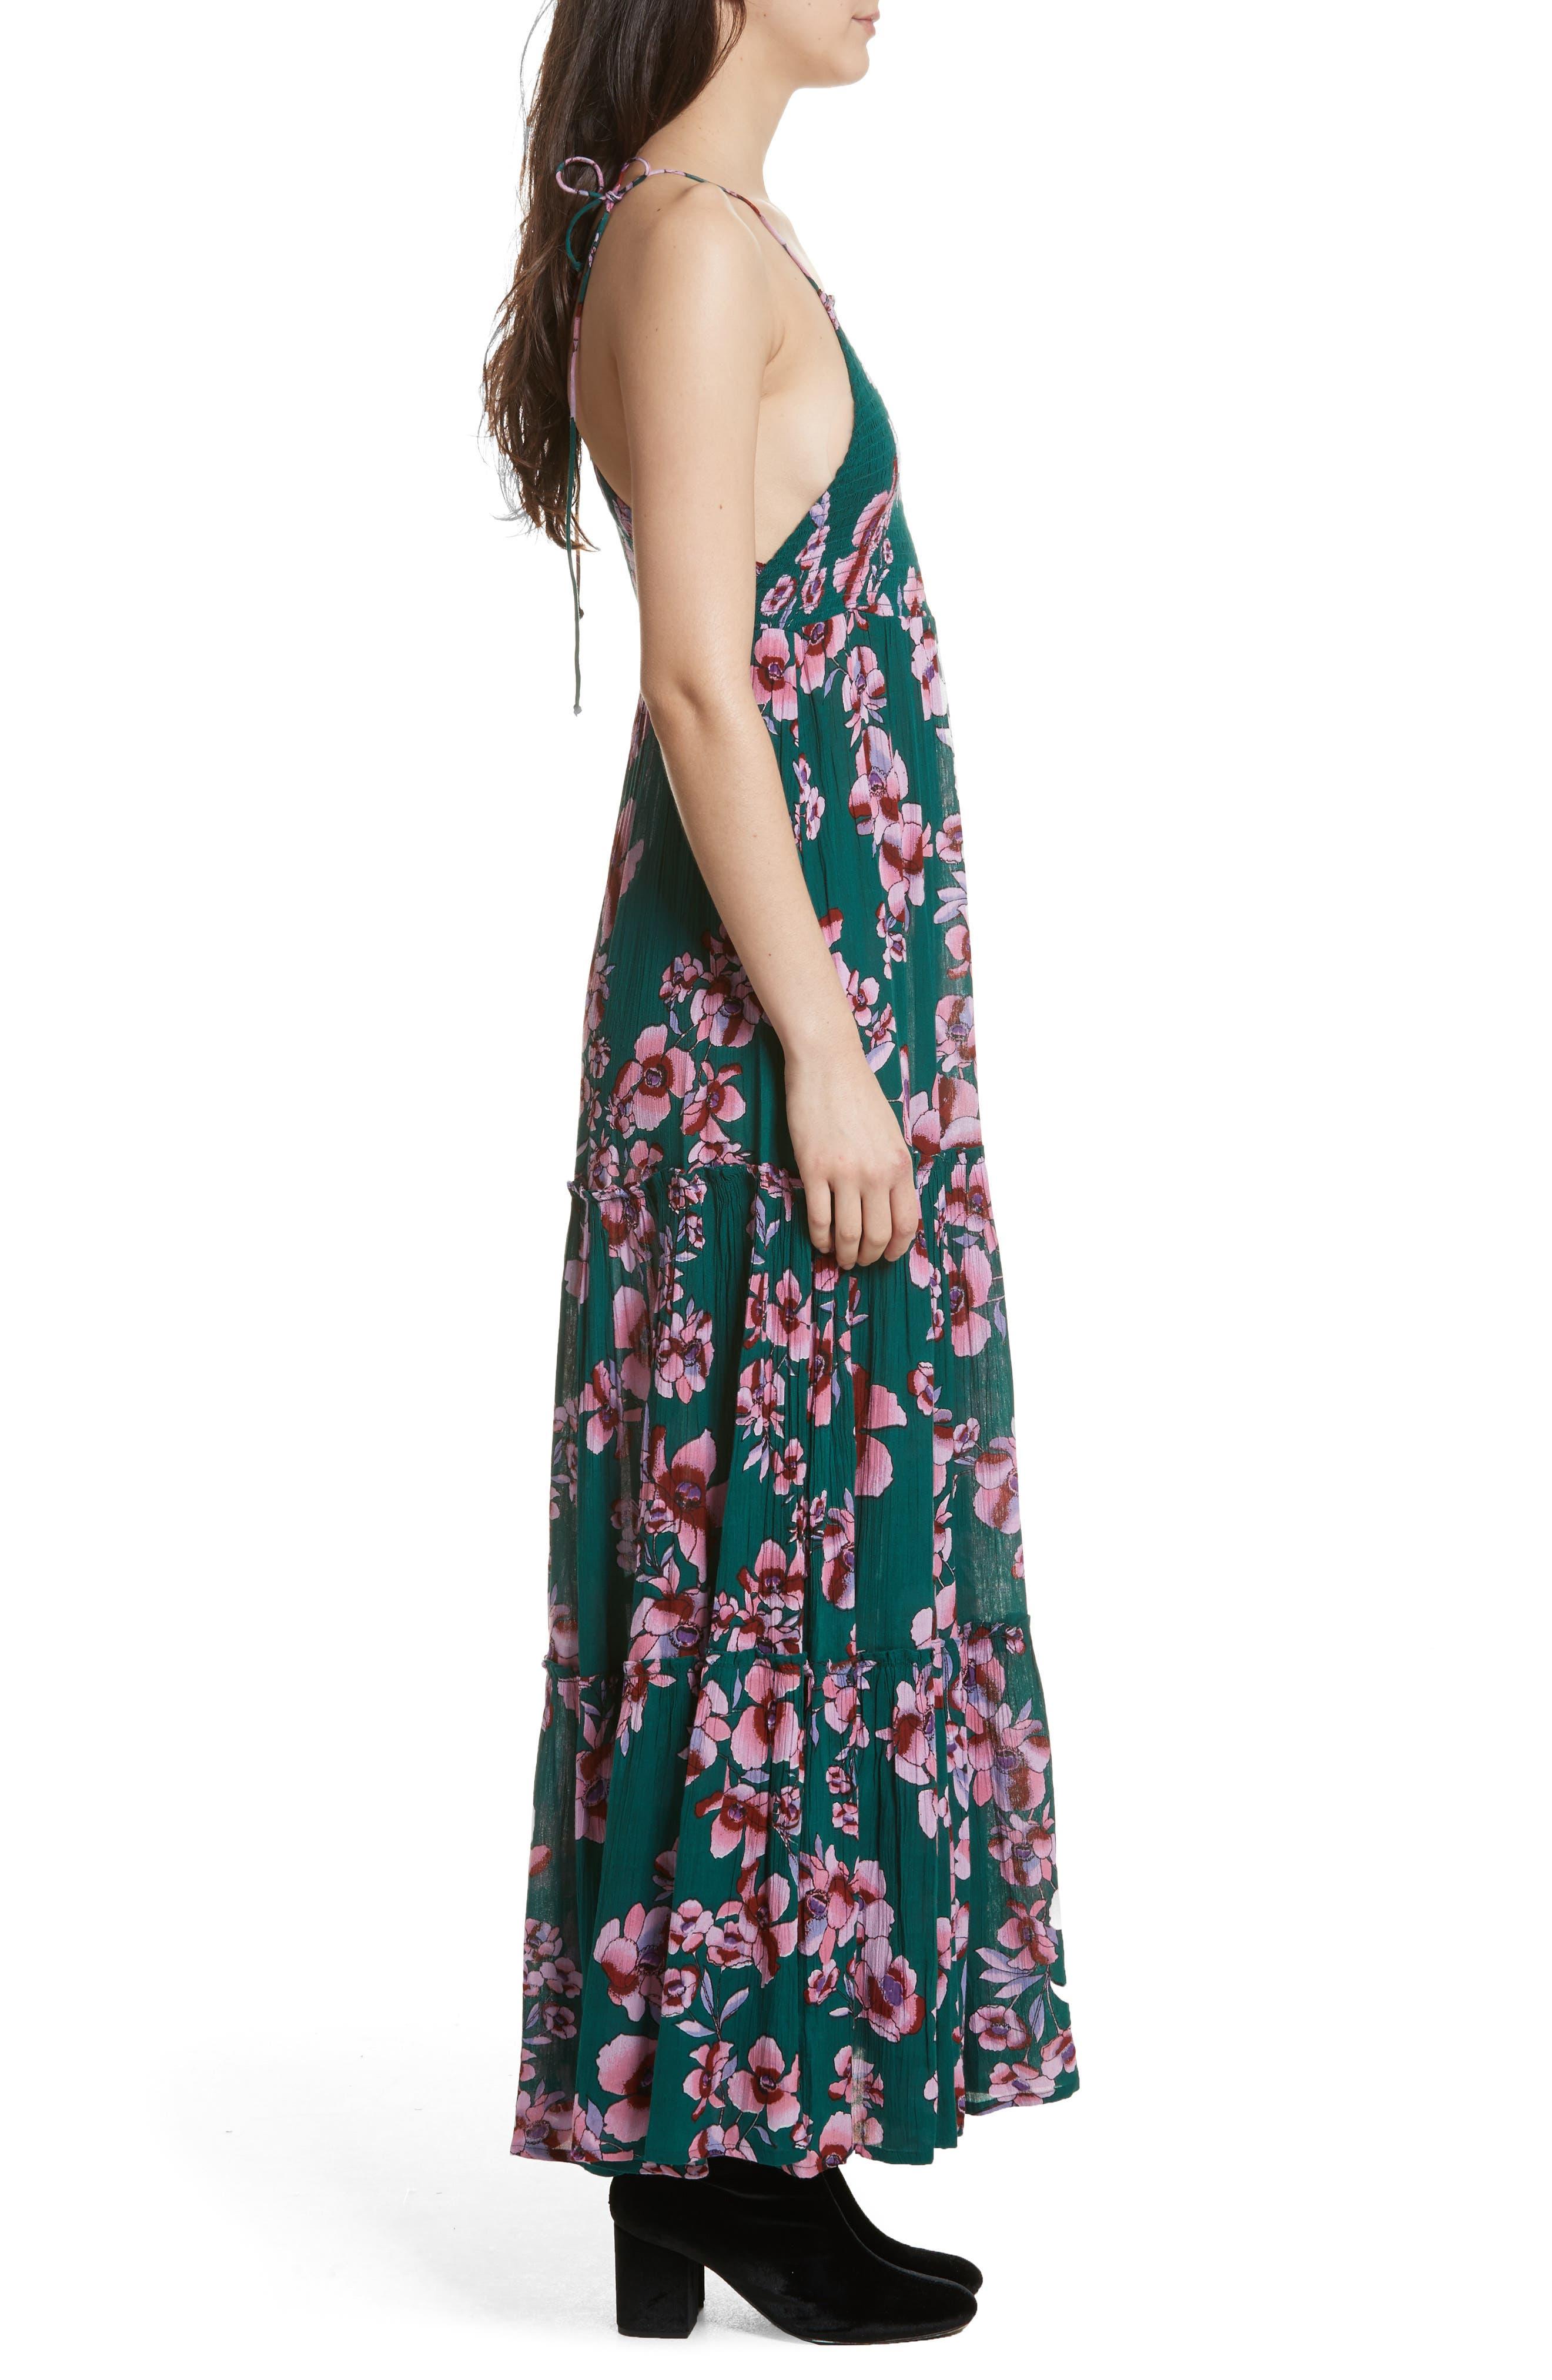 Garden Party Maxi Dress,                             Alternate thumbnail 3, color,                             Turquoise